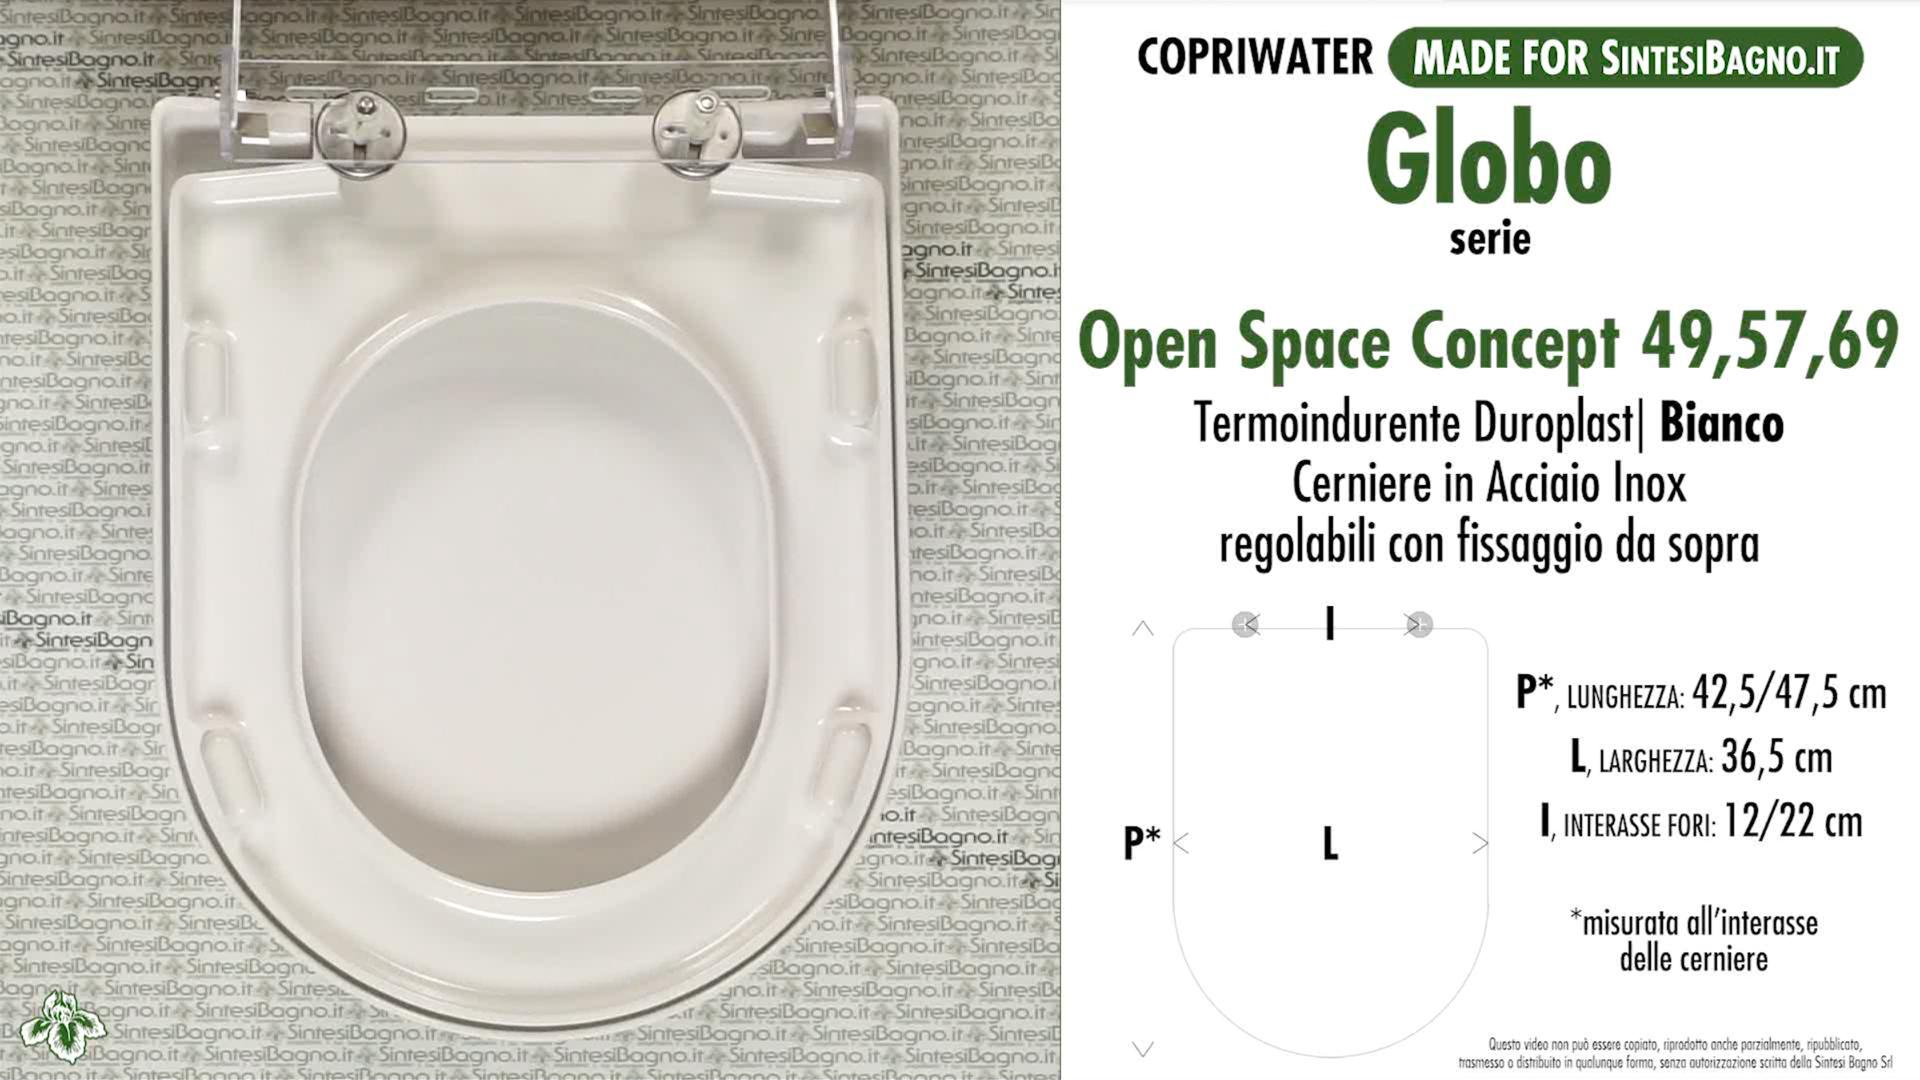 SCHEDA TECNICA MISURE copriwater GLOBO OPEN SPACE CONCEPT